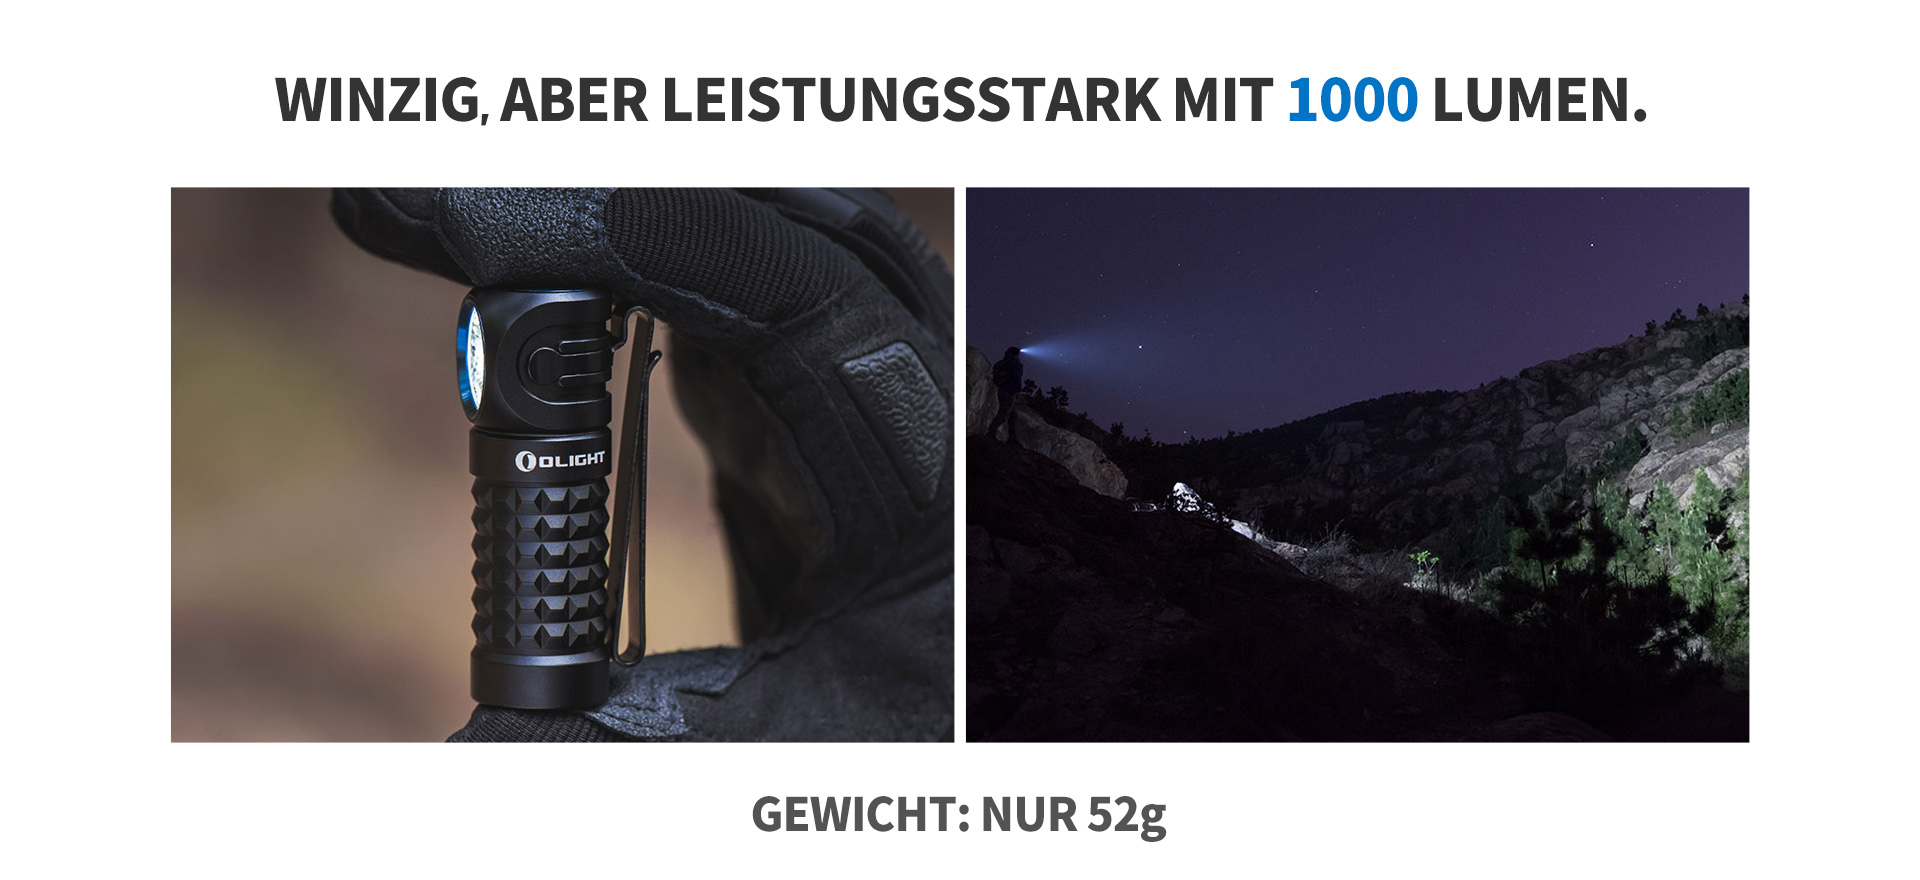 Perun mini taschenlampe 1000 lumen